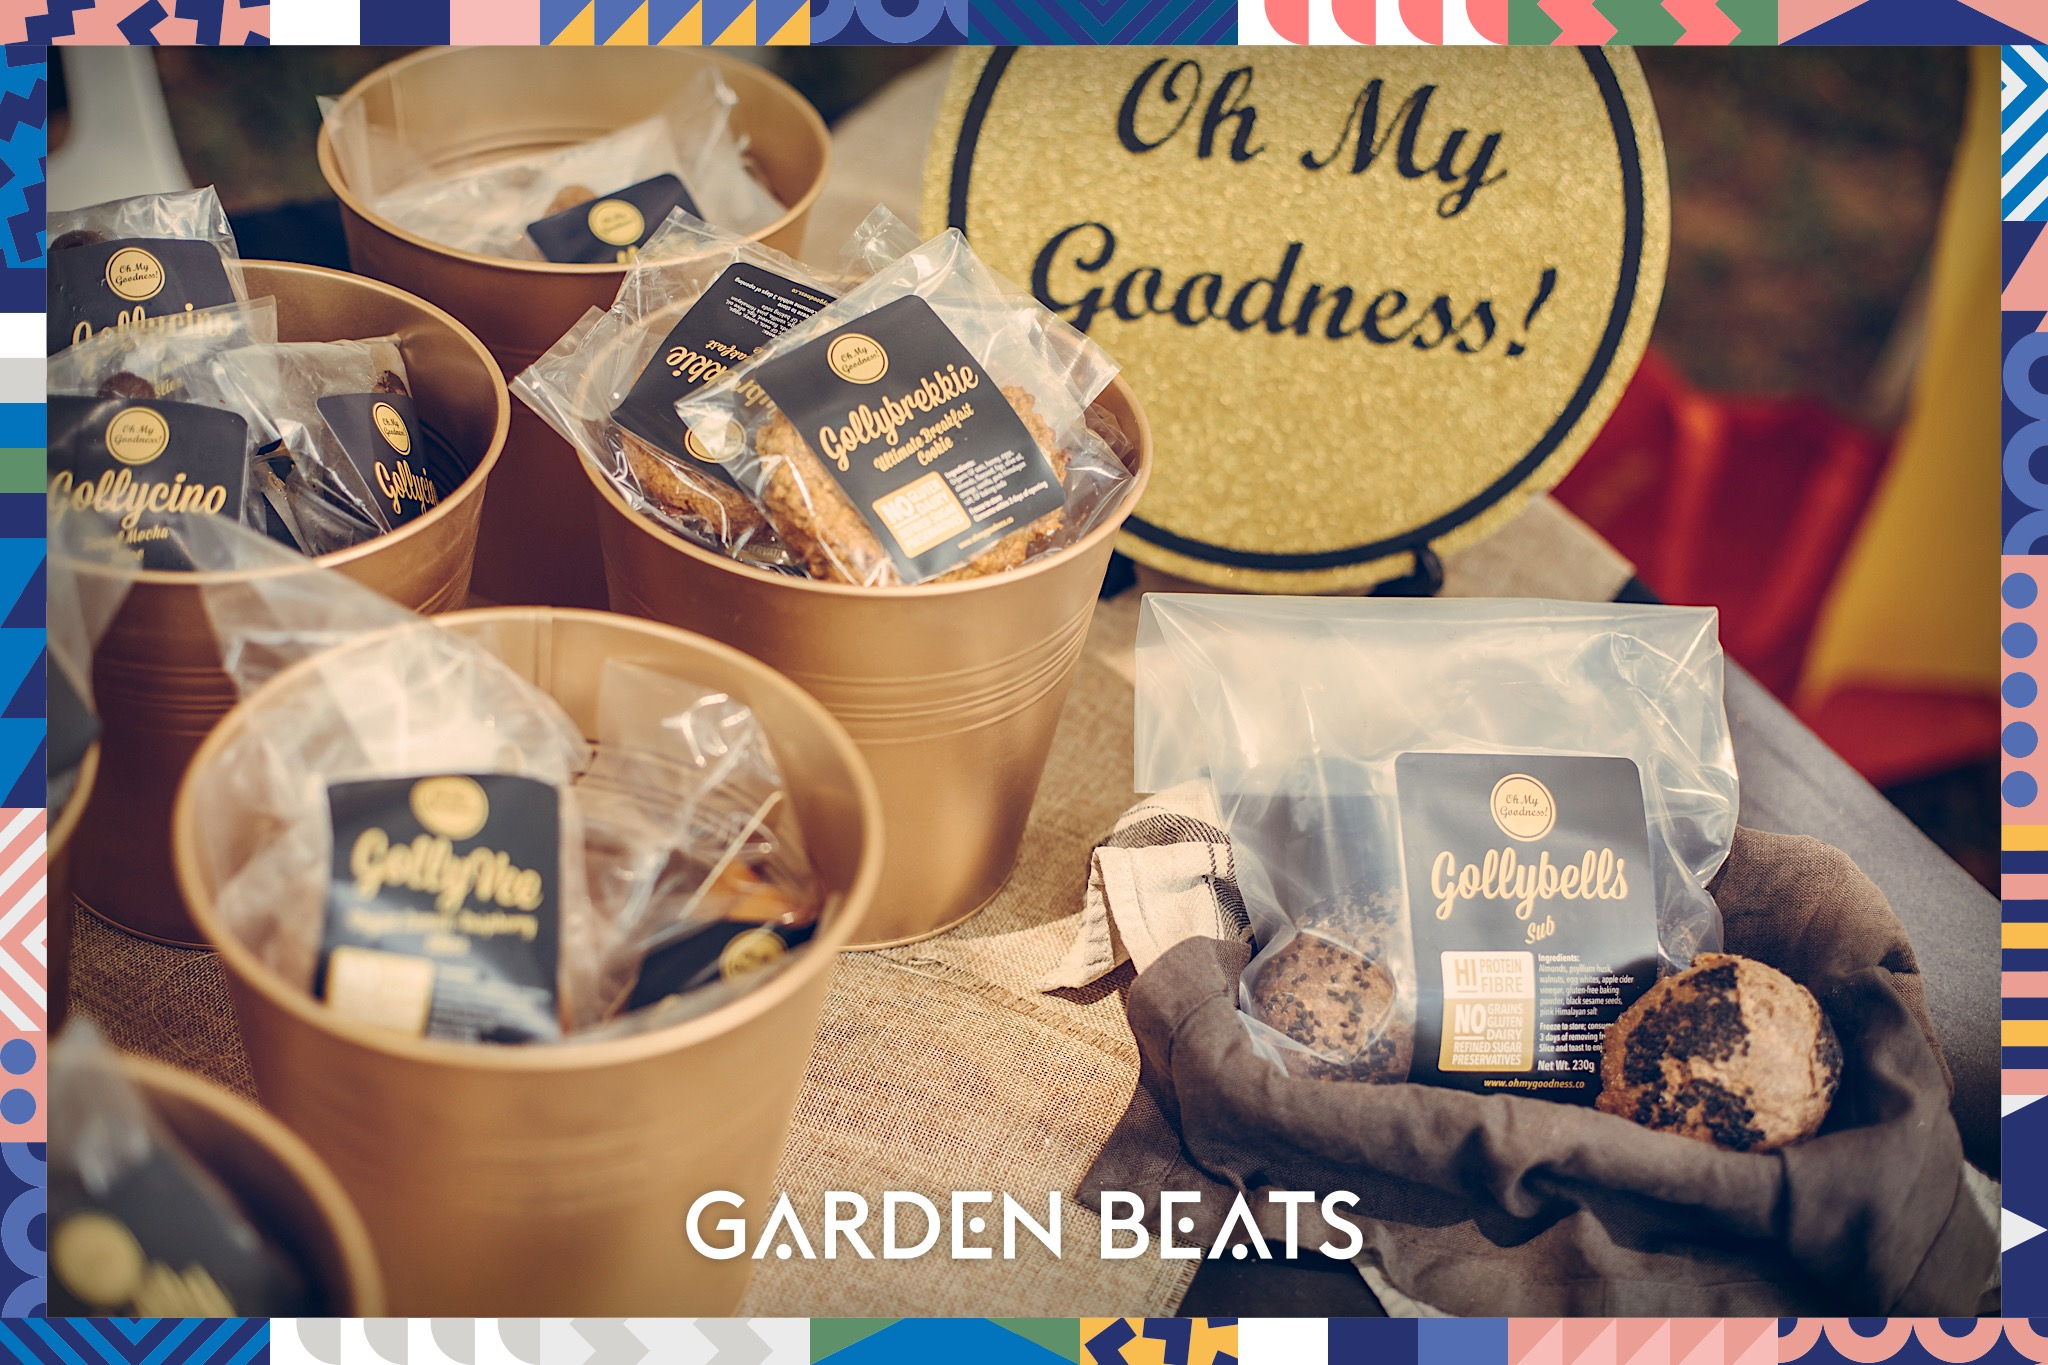 03032018_GardenBeats_Colossal138_Watermarked.jpg